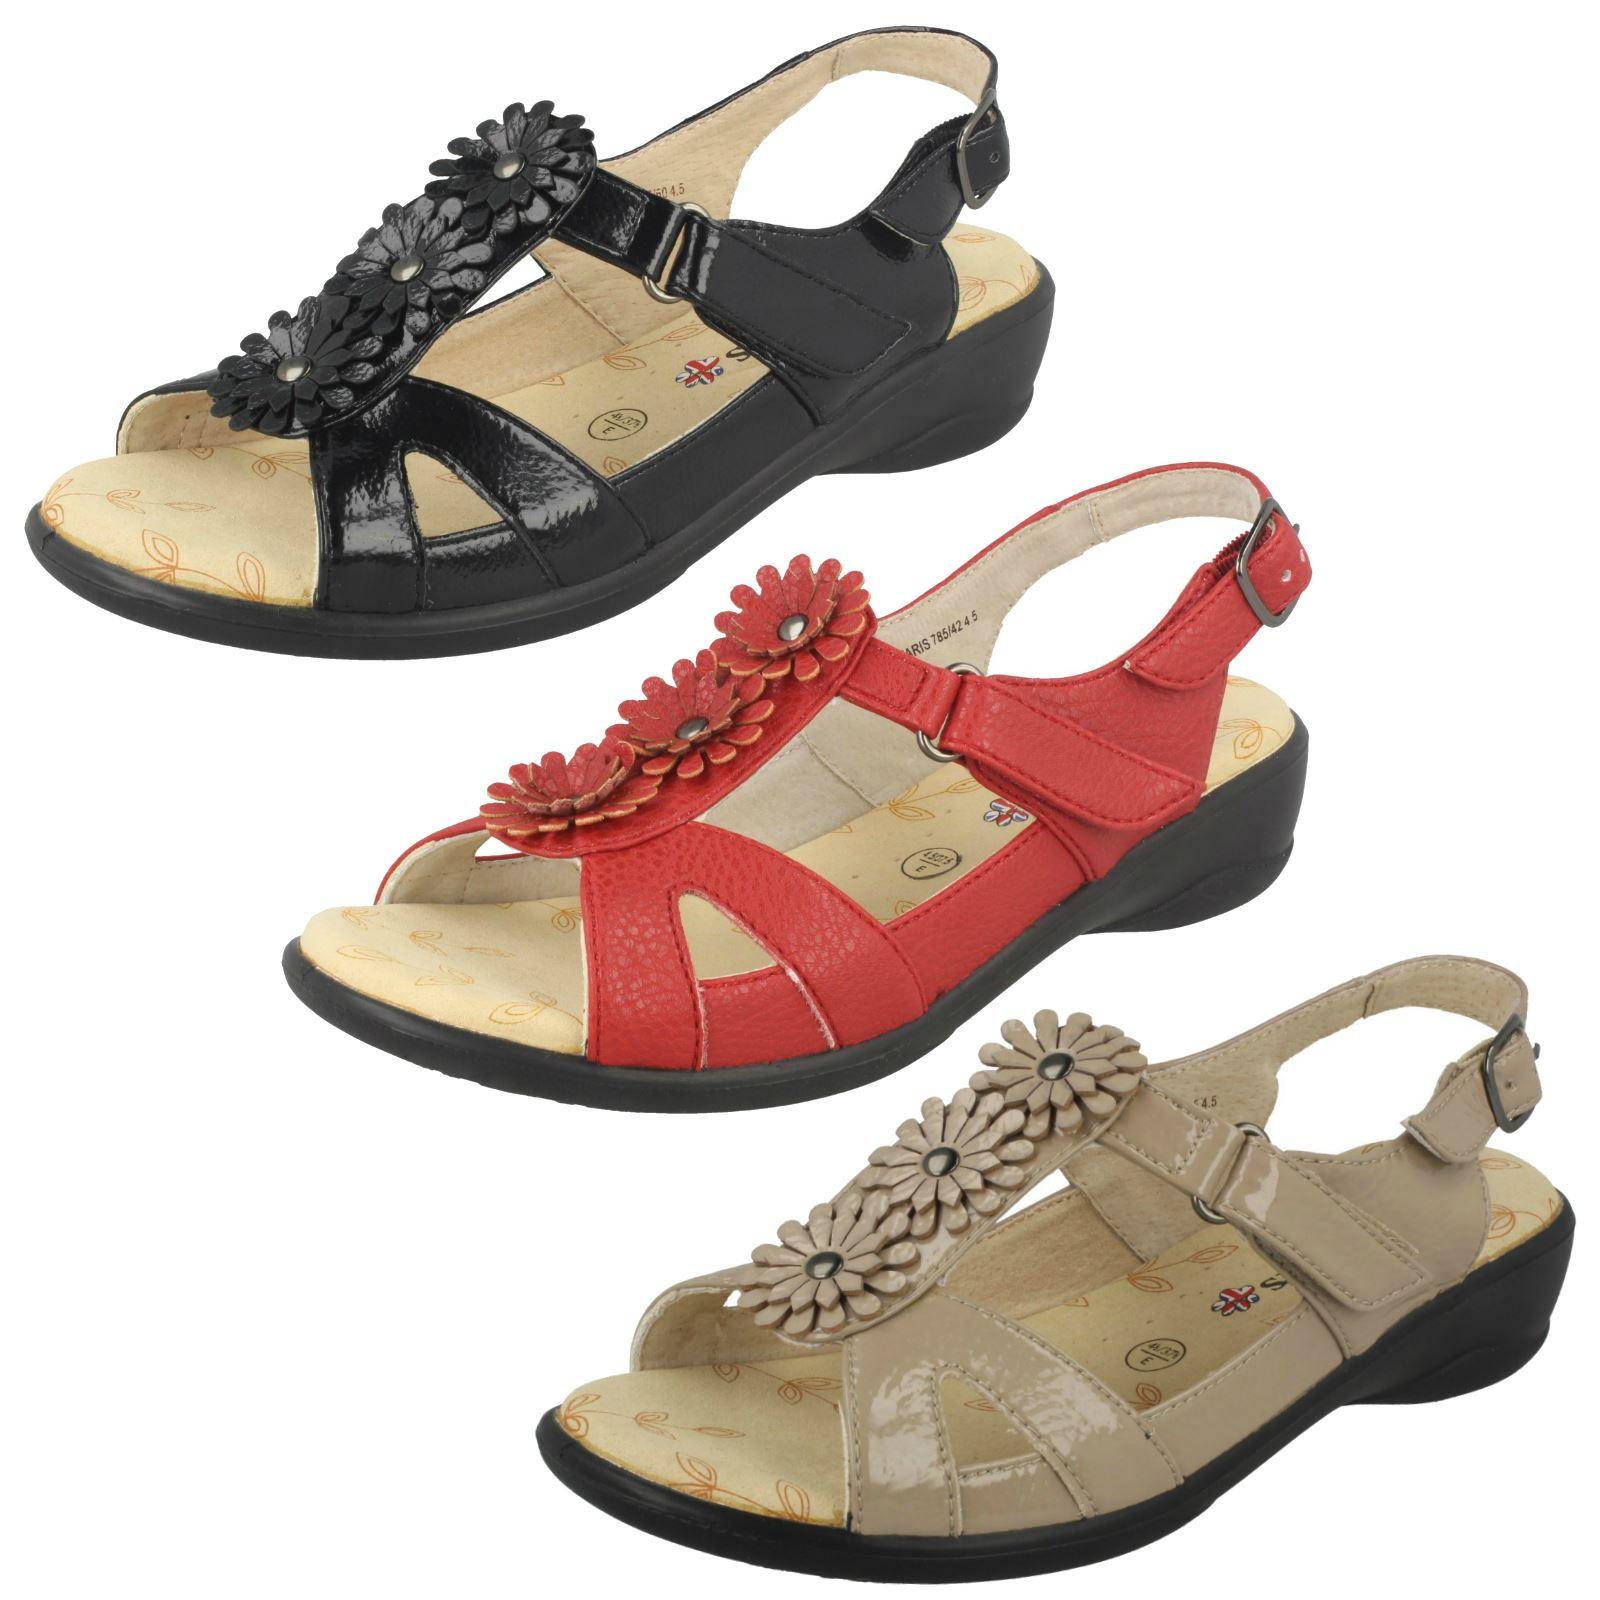 best supplier footwear buy good Details about Ladies Padders Wide Fitting Sandals 'Paris'